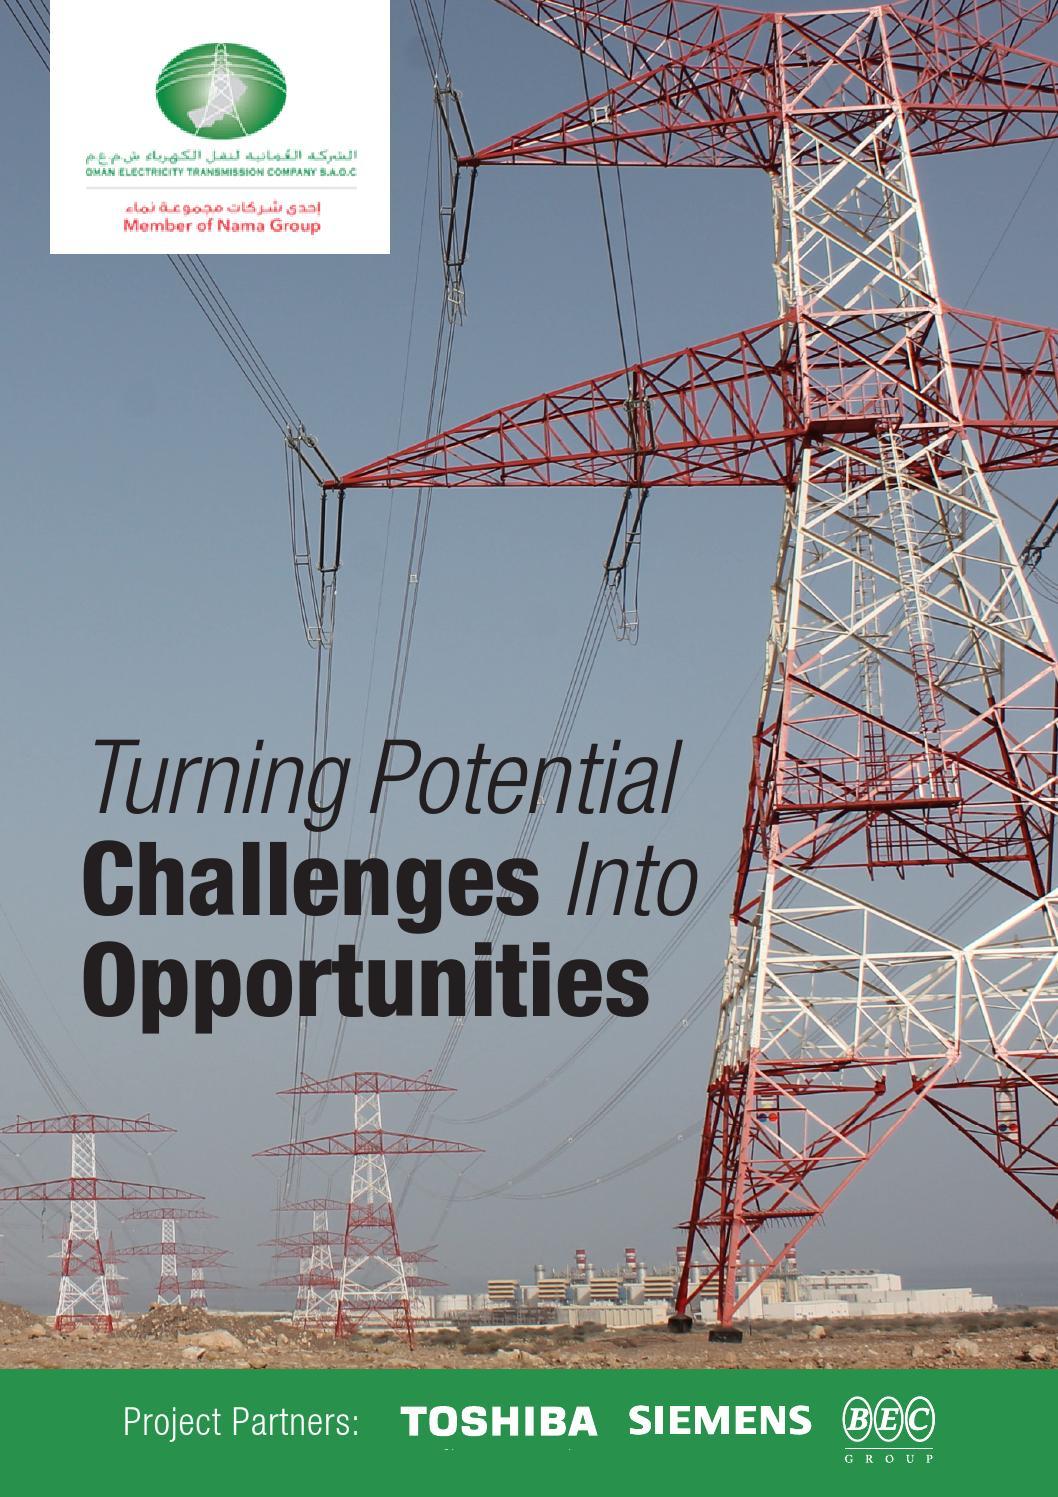 Oman Electricity Transmission Company Brochure - 2015 by